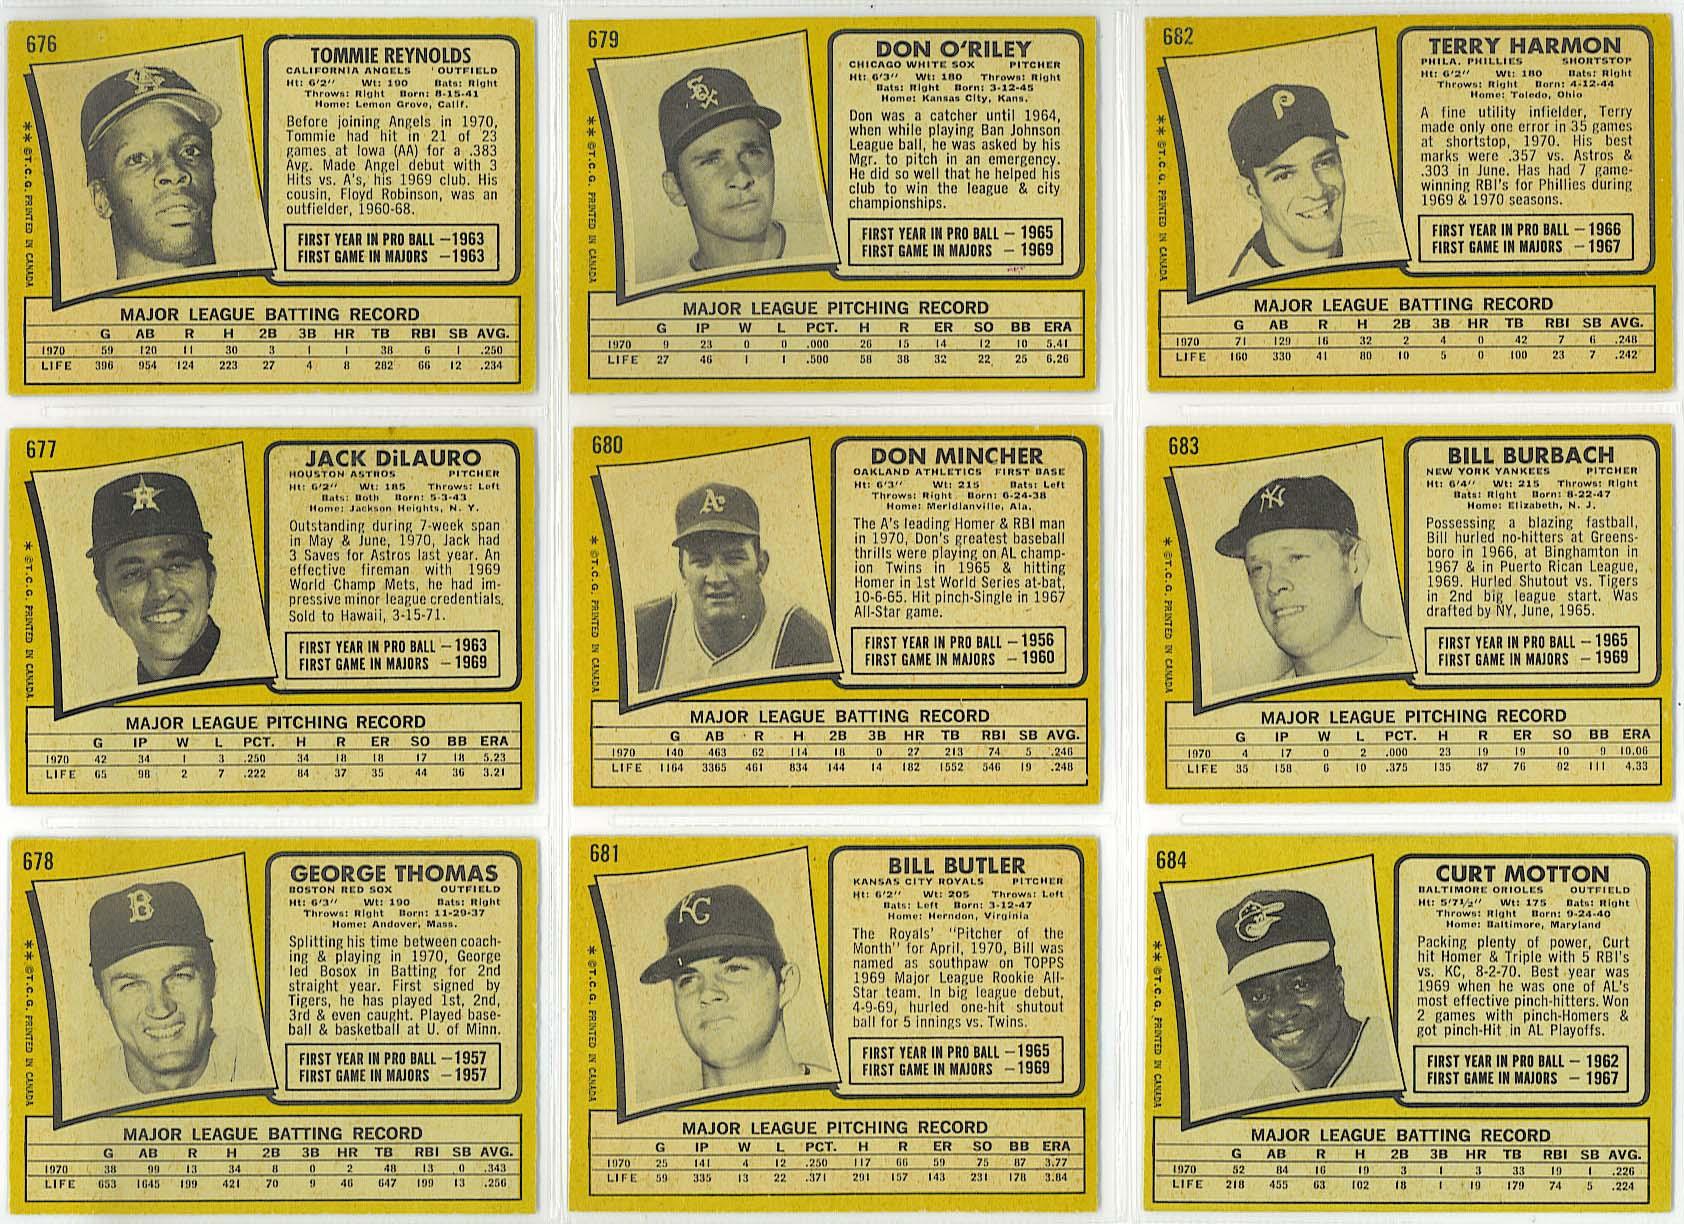 1971 OPC baseball - cards 676-684 backs